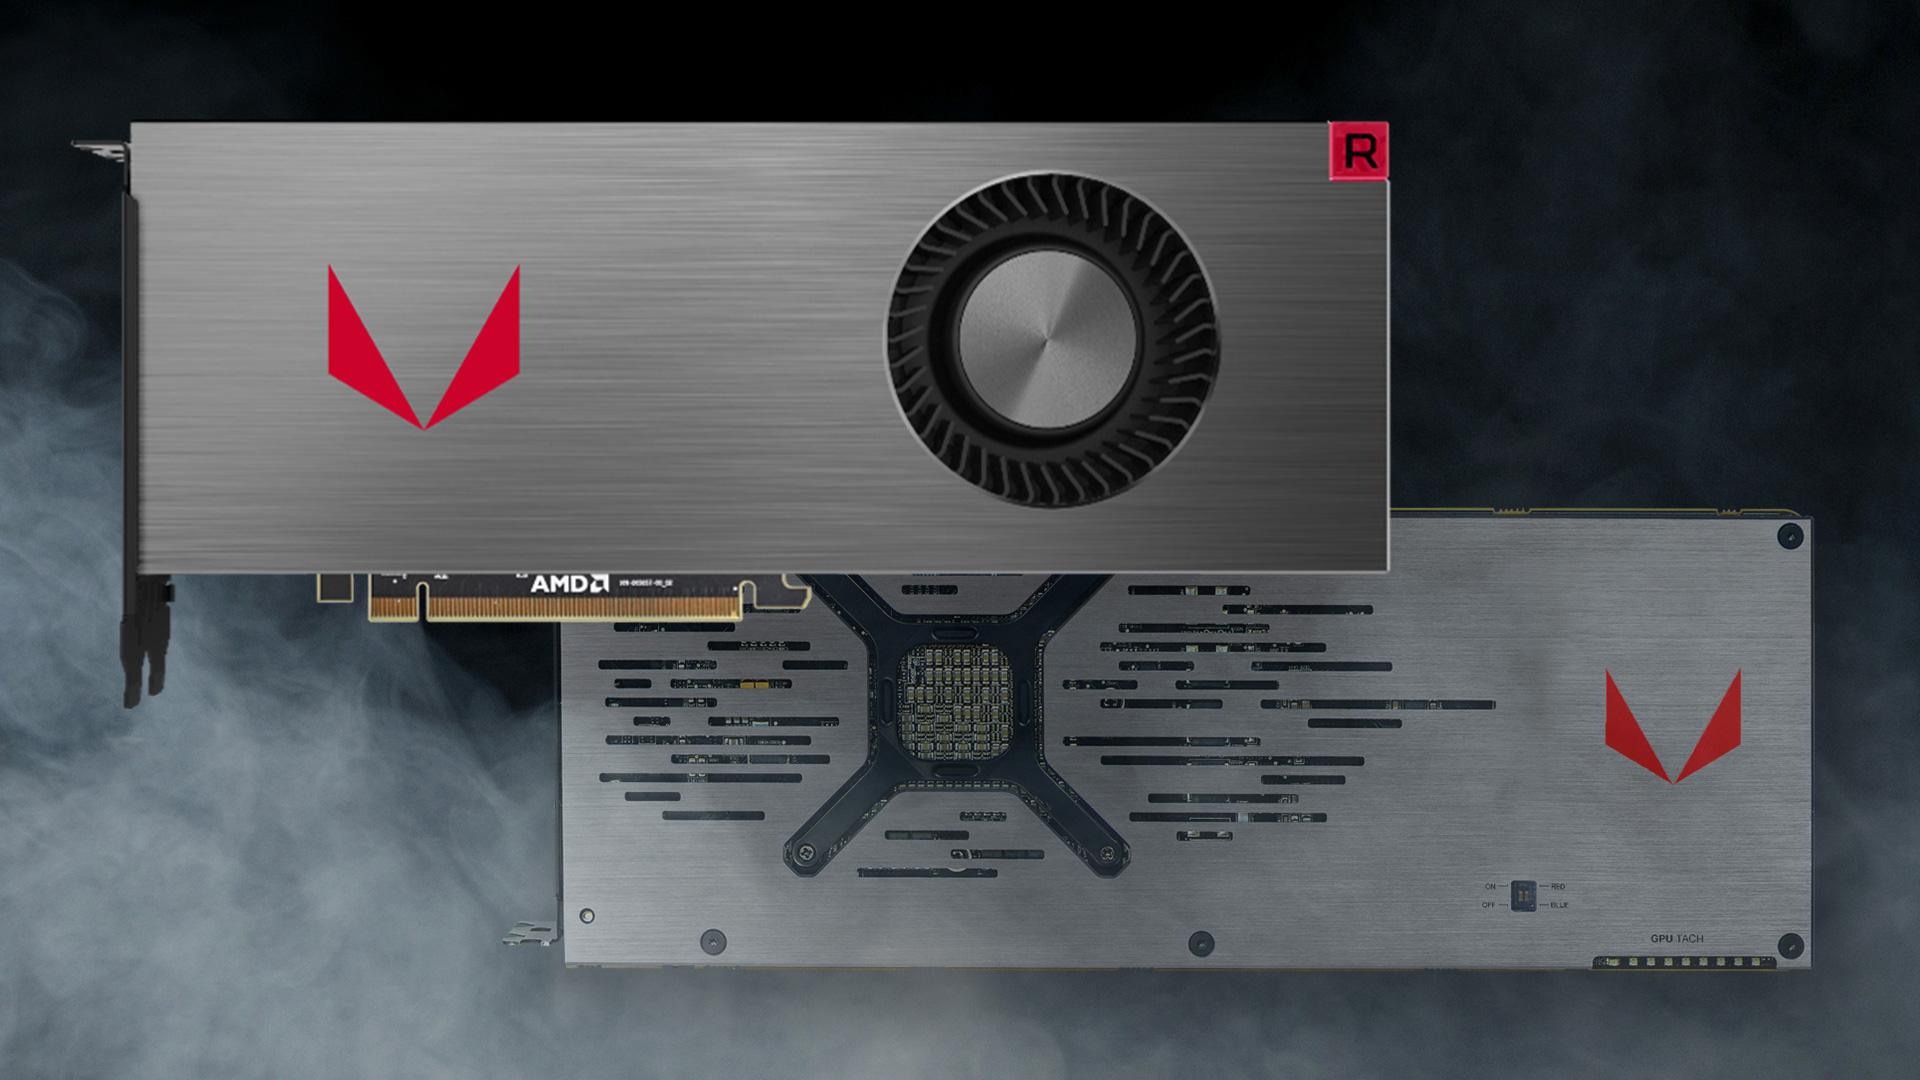 AMD's Raja Koduri Breaks Silence On Vega - Discusses Pricing